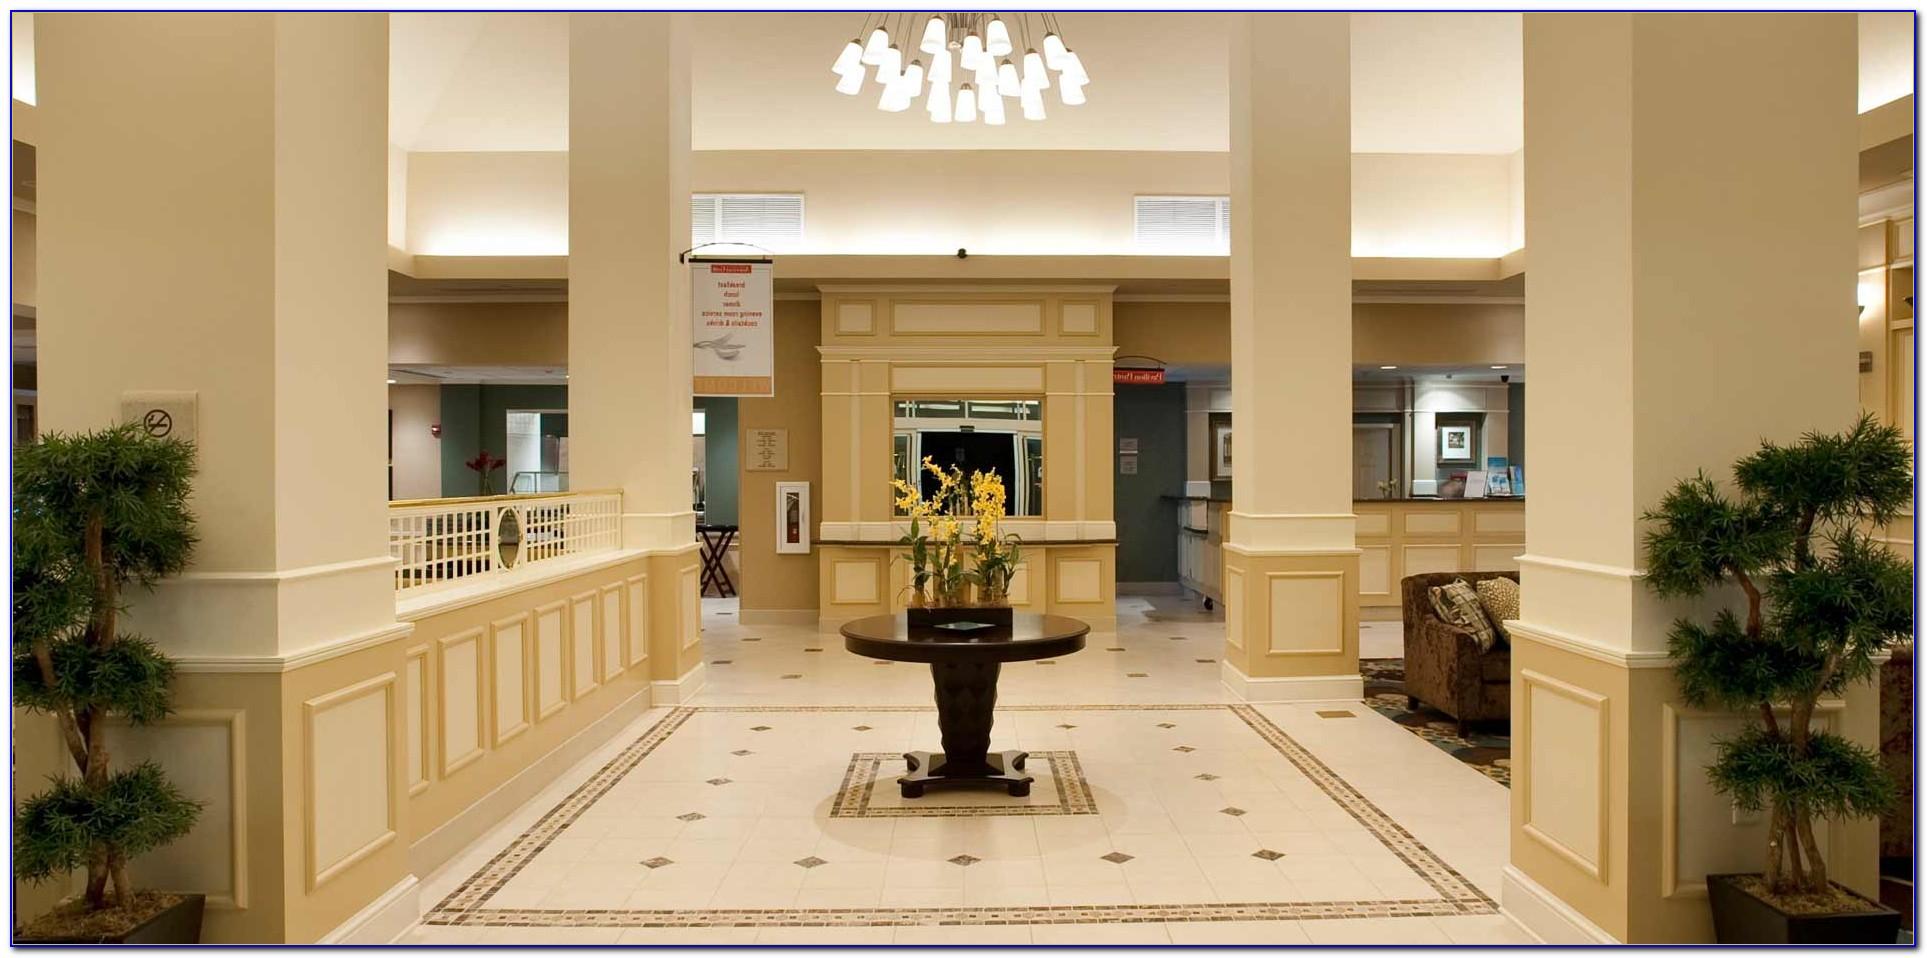 Hilton Garden Inn Ridgefield Park Ridgefield Park Nj 07660 Garden Home Design Ideas